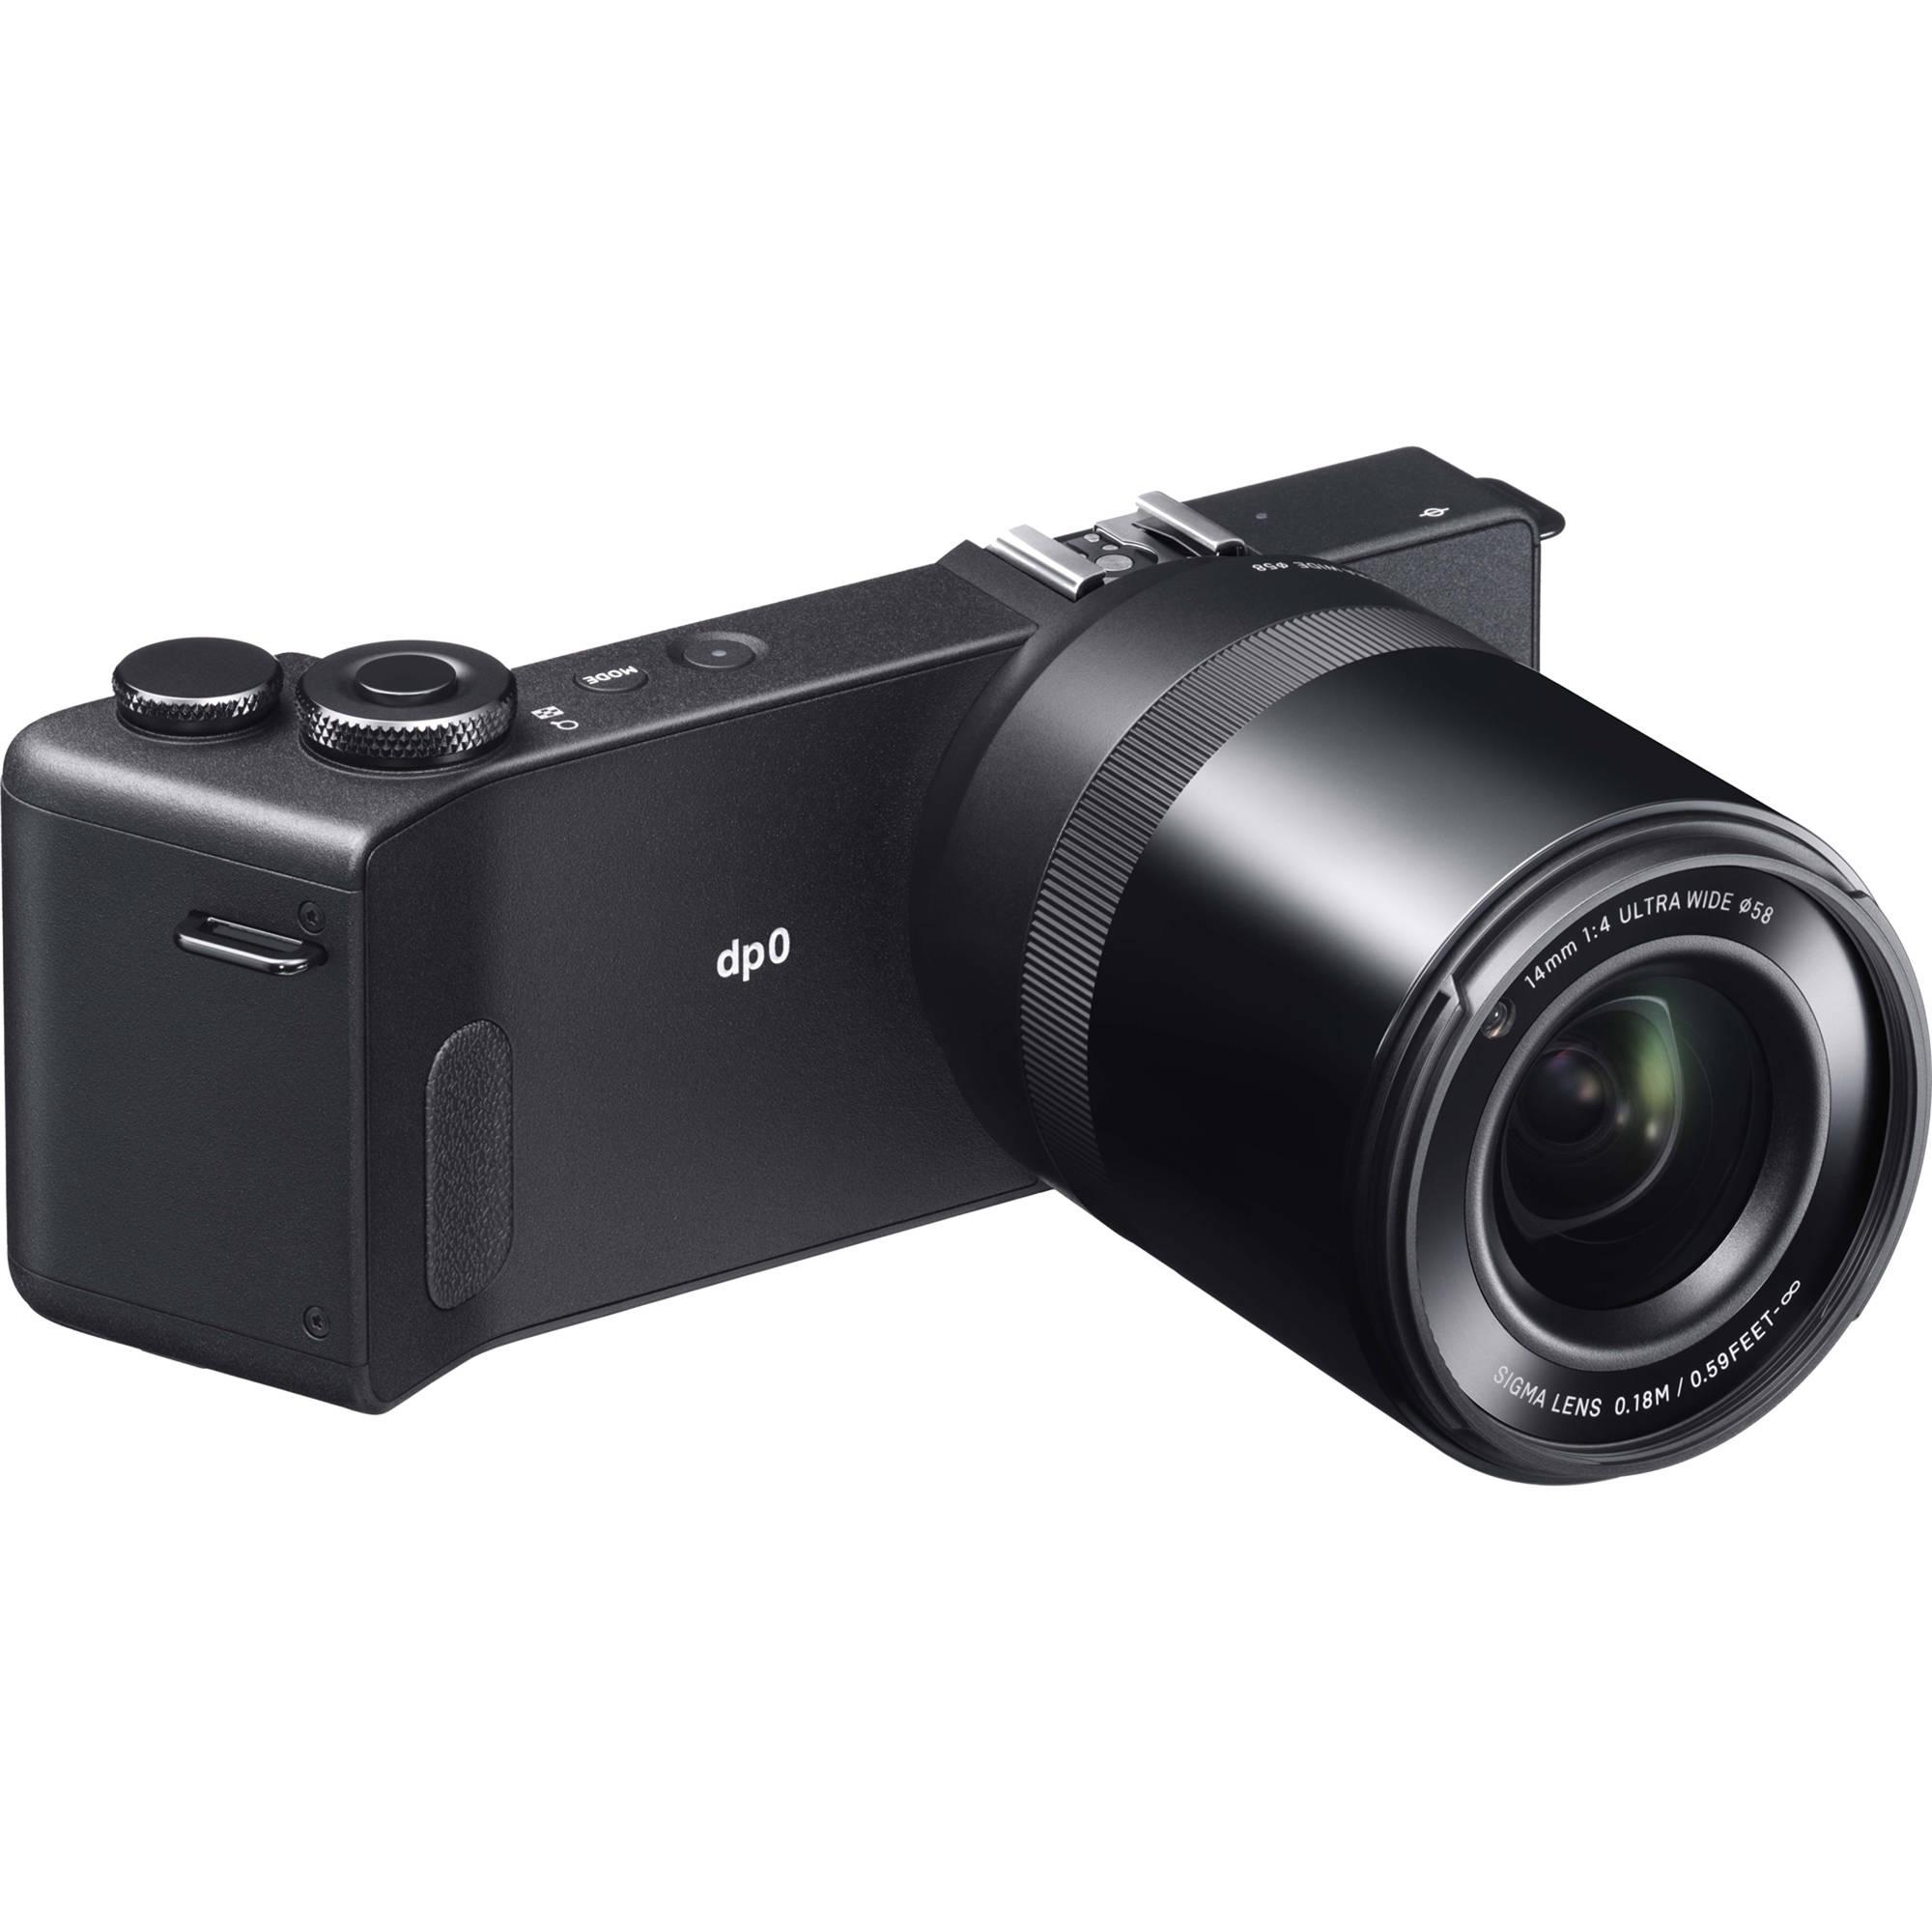 SIGMA dp0 Quattro Camera Drivers for Windows 10